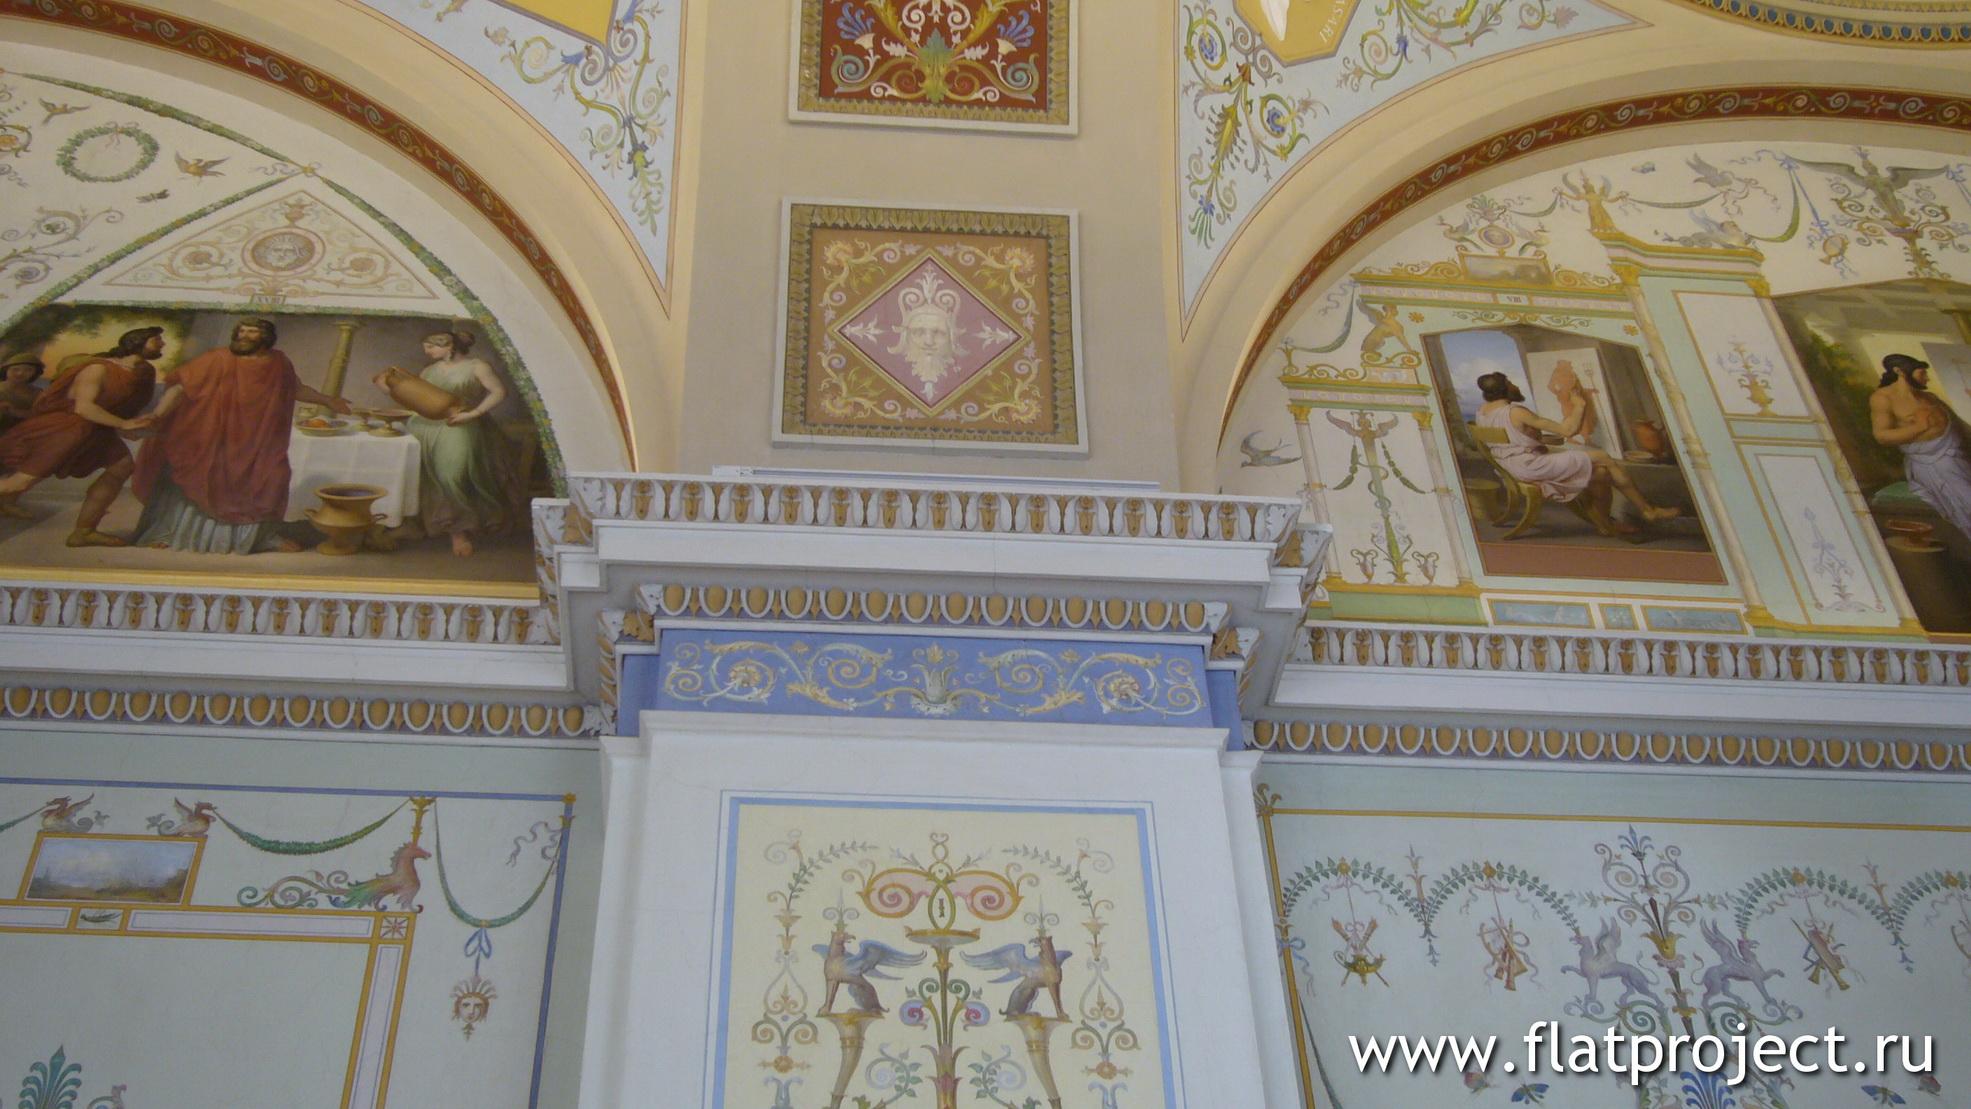 The State Hermitage museum interiors – photo 244